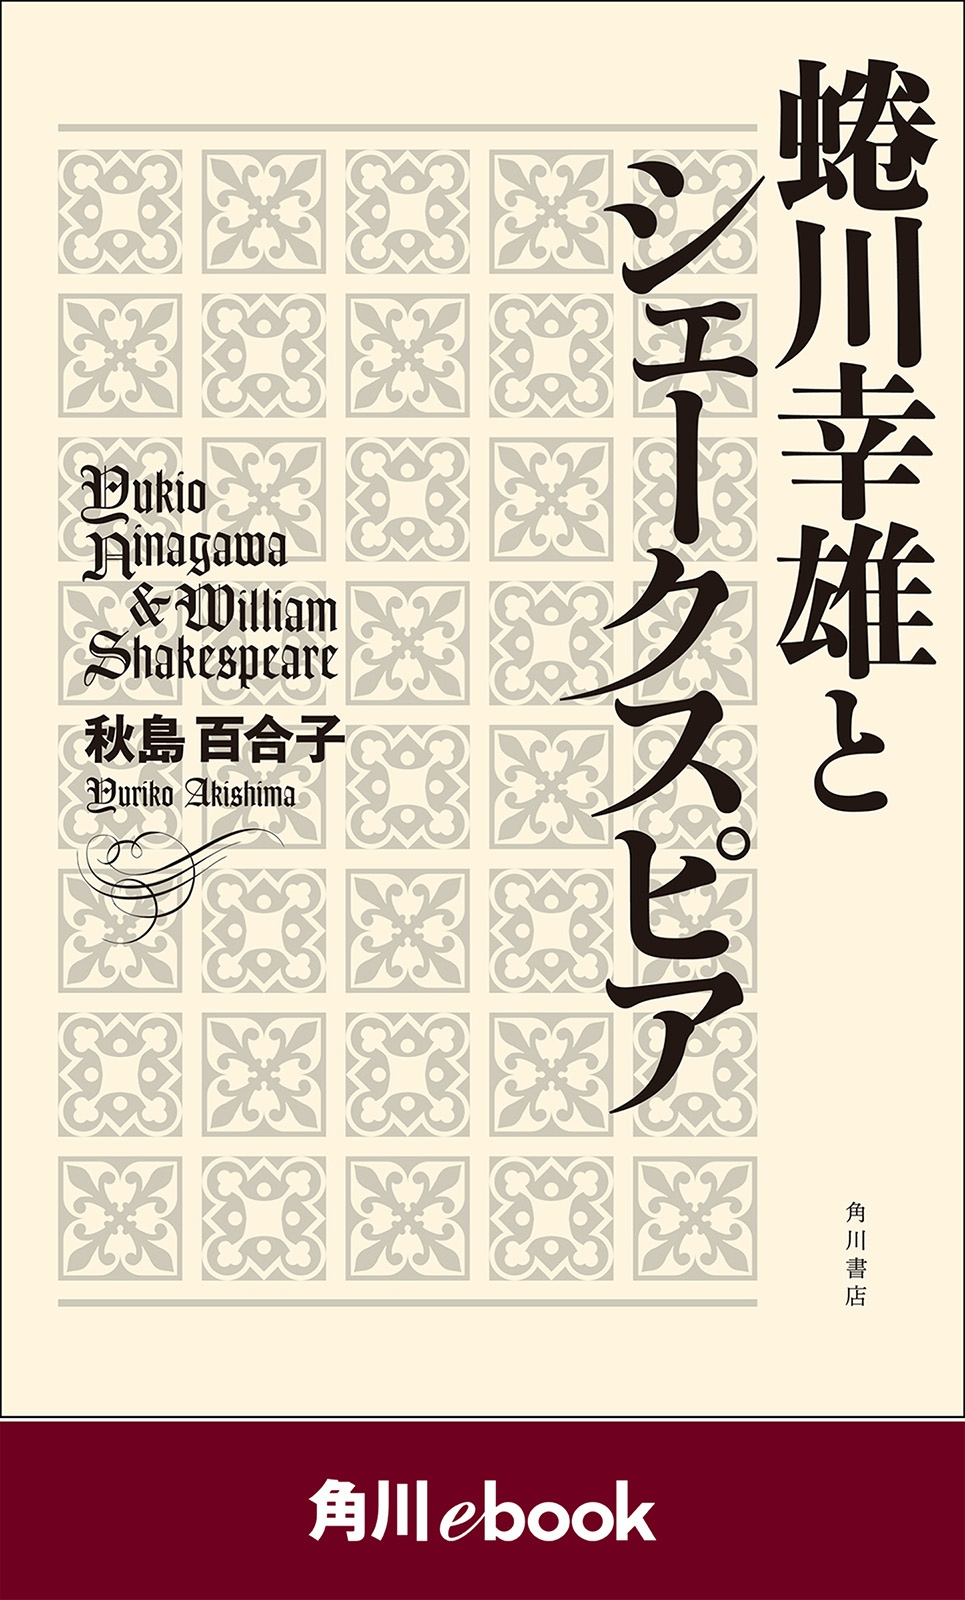 角川ebook創刊記念20冊試し読み合本-電子書籍